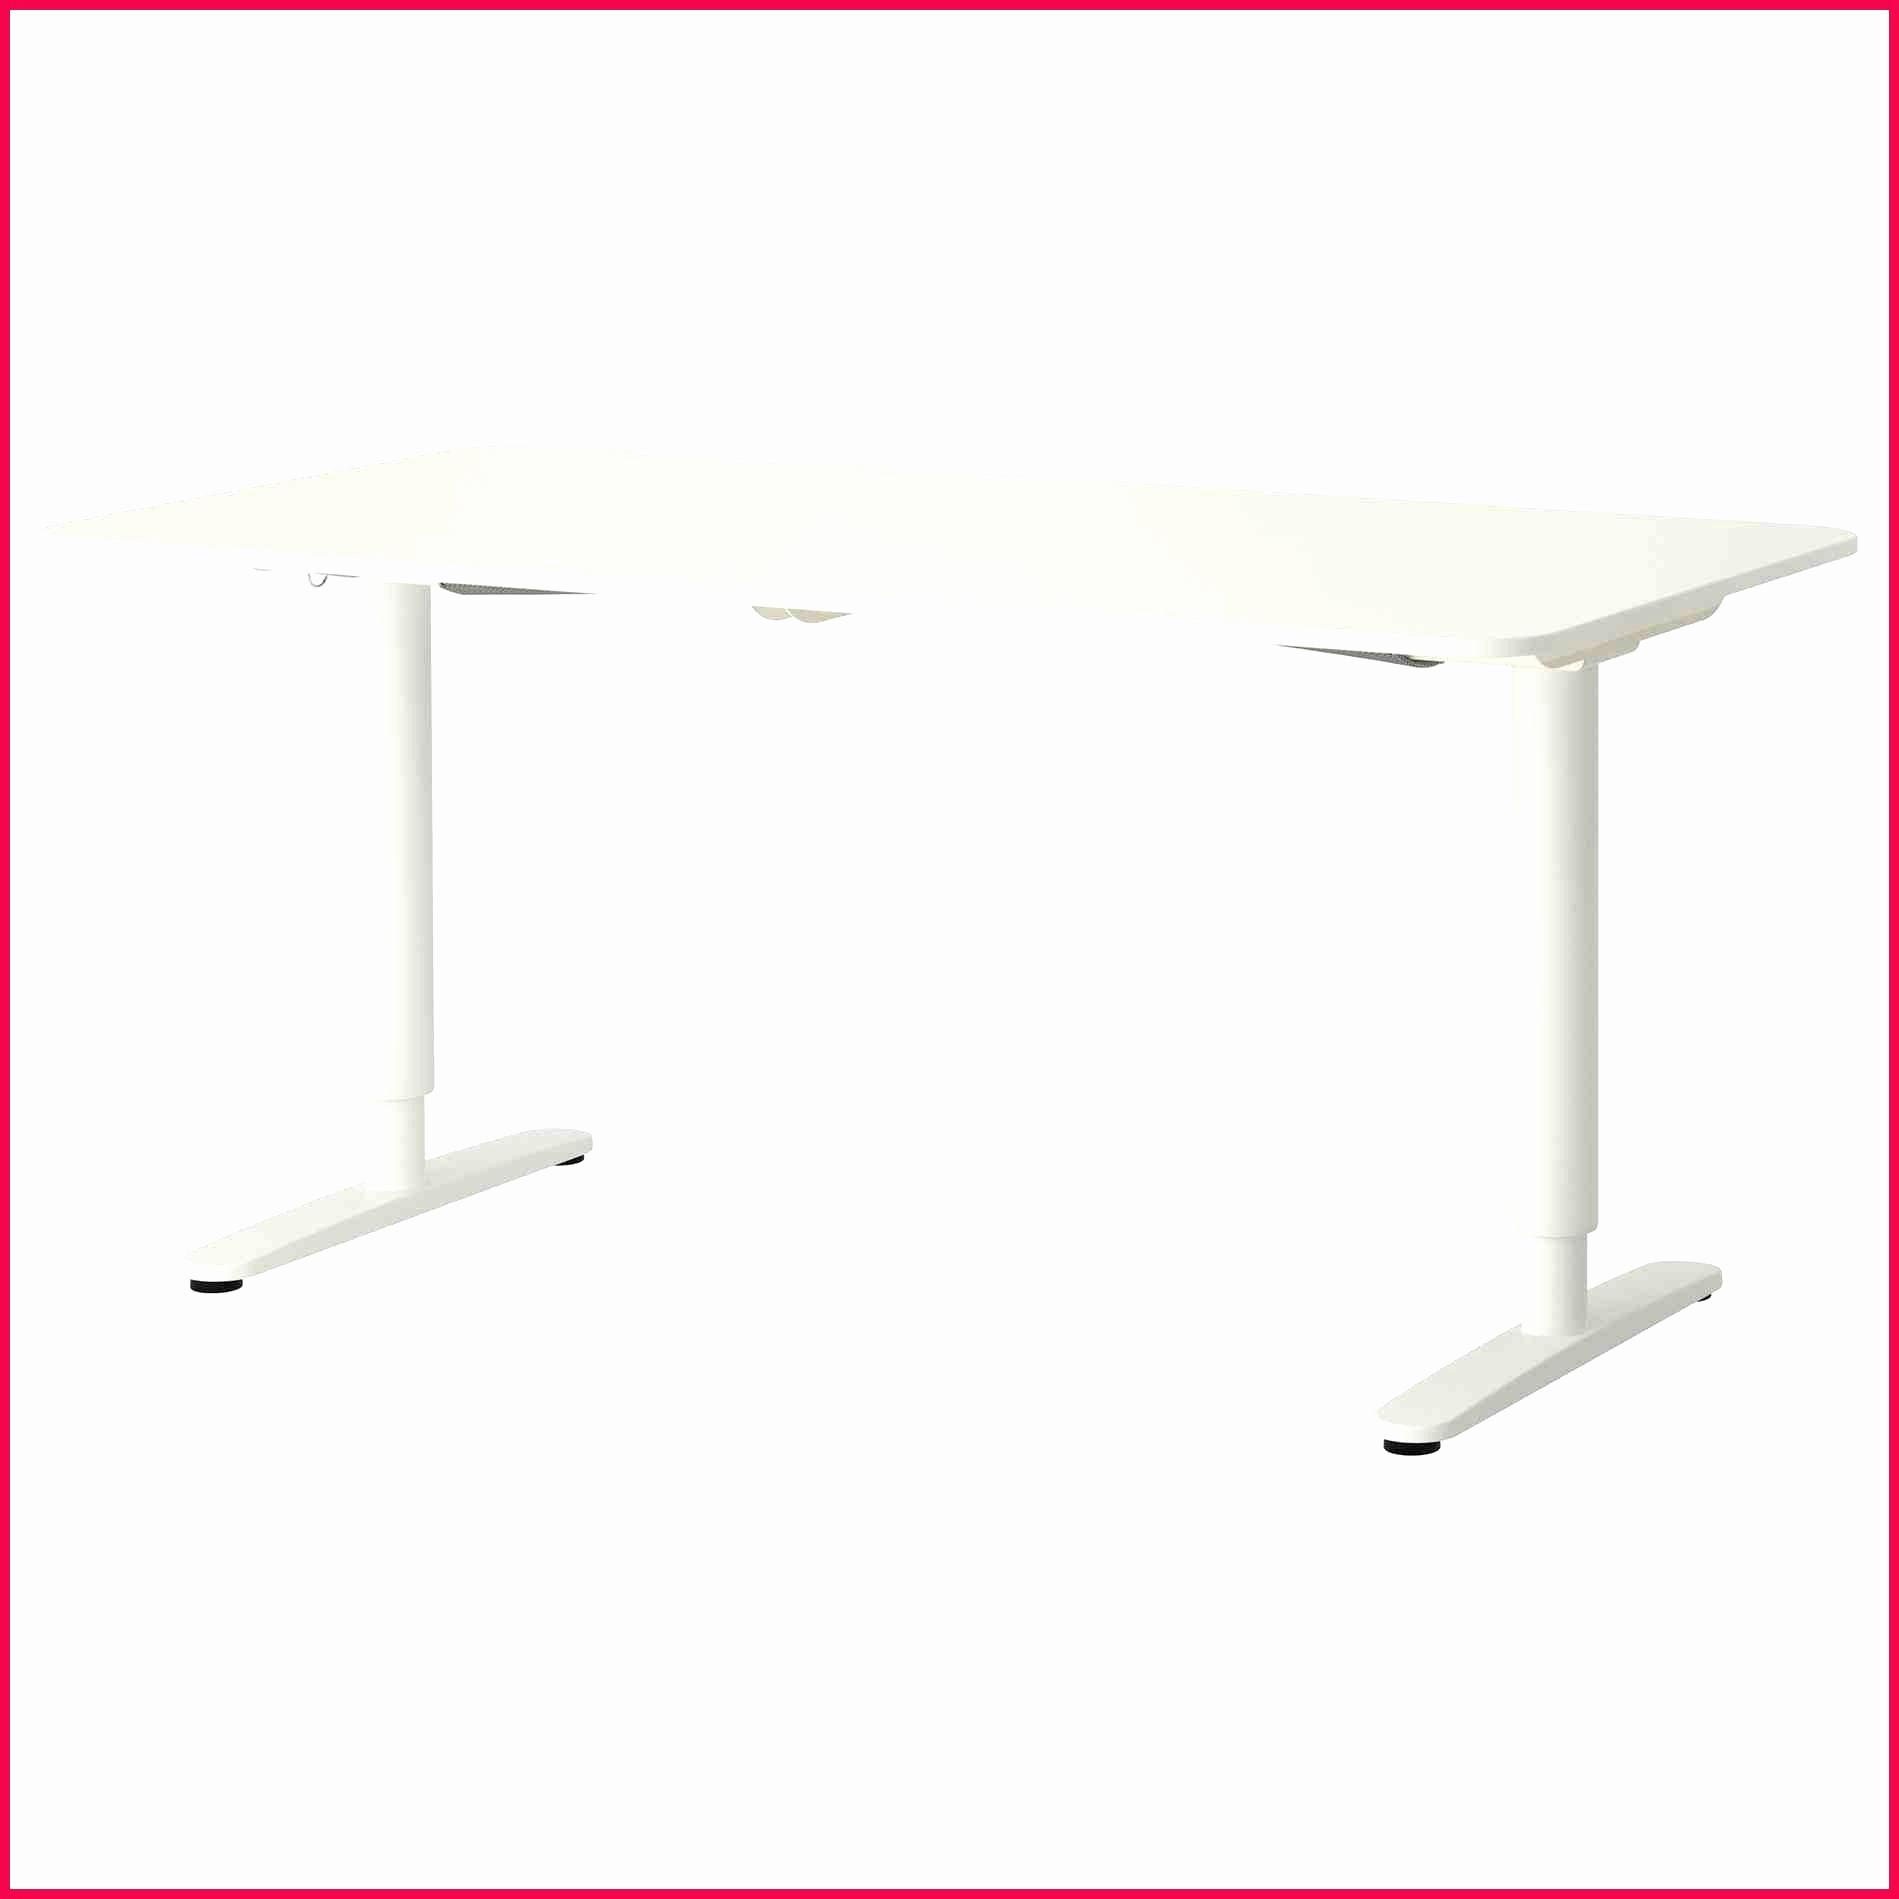 Ikea Salles De Bains Luxe Image Bureau Ikea Angle Frais Ikea Meuble D Angle Meuble Salle De Bain